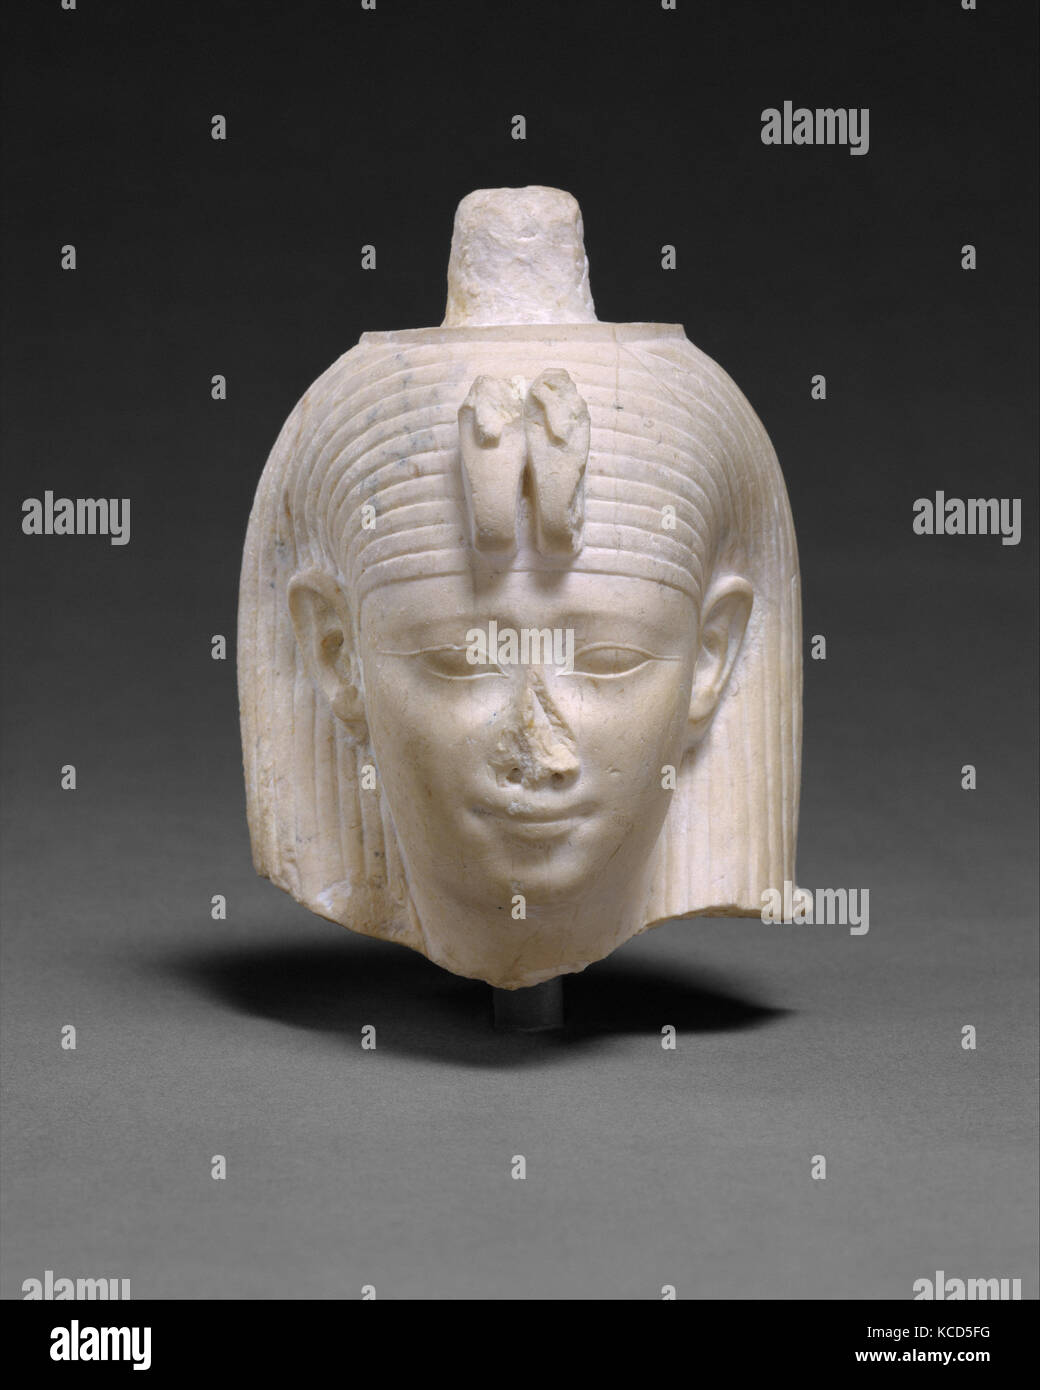 Head Attributed to Arsinoe II, Ptolemaic Period, 278–270 B.C., From Egypt, Memphite Region, Abu Rawash, IFAO excavations - Stock Image